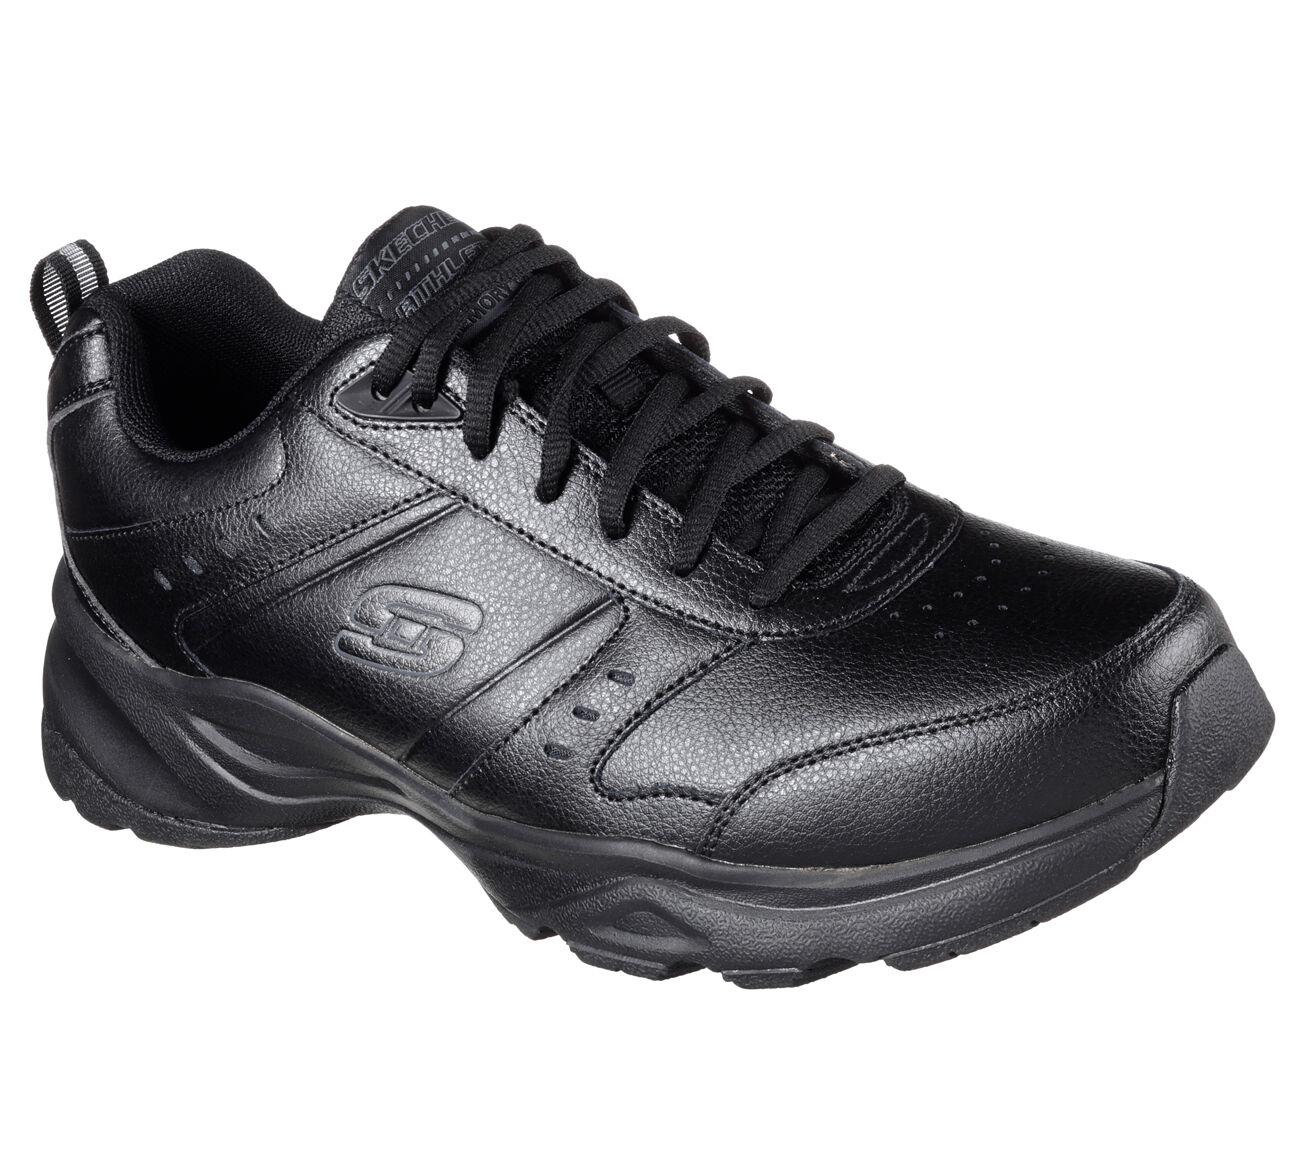 Skechers Men's 58355 BLK Haniger Leather Memory Foam Black shoes Brand New